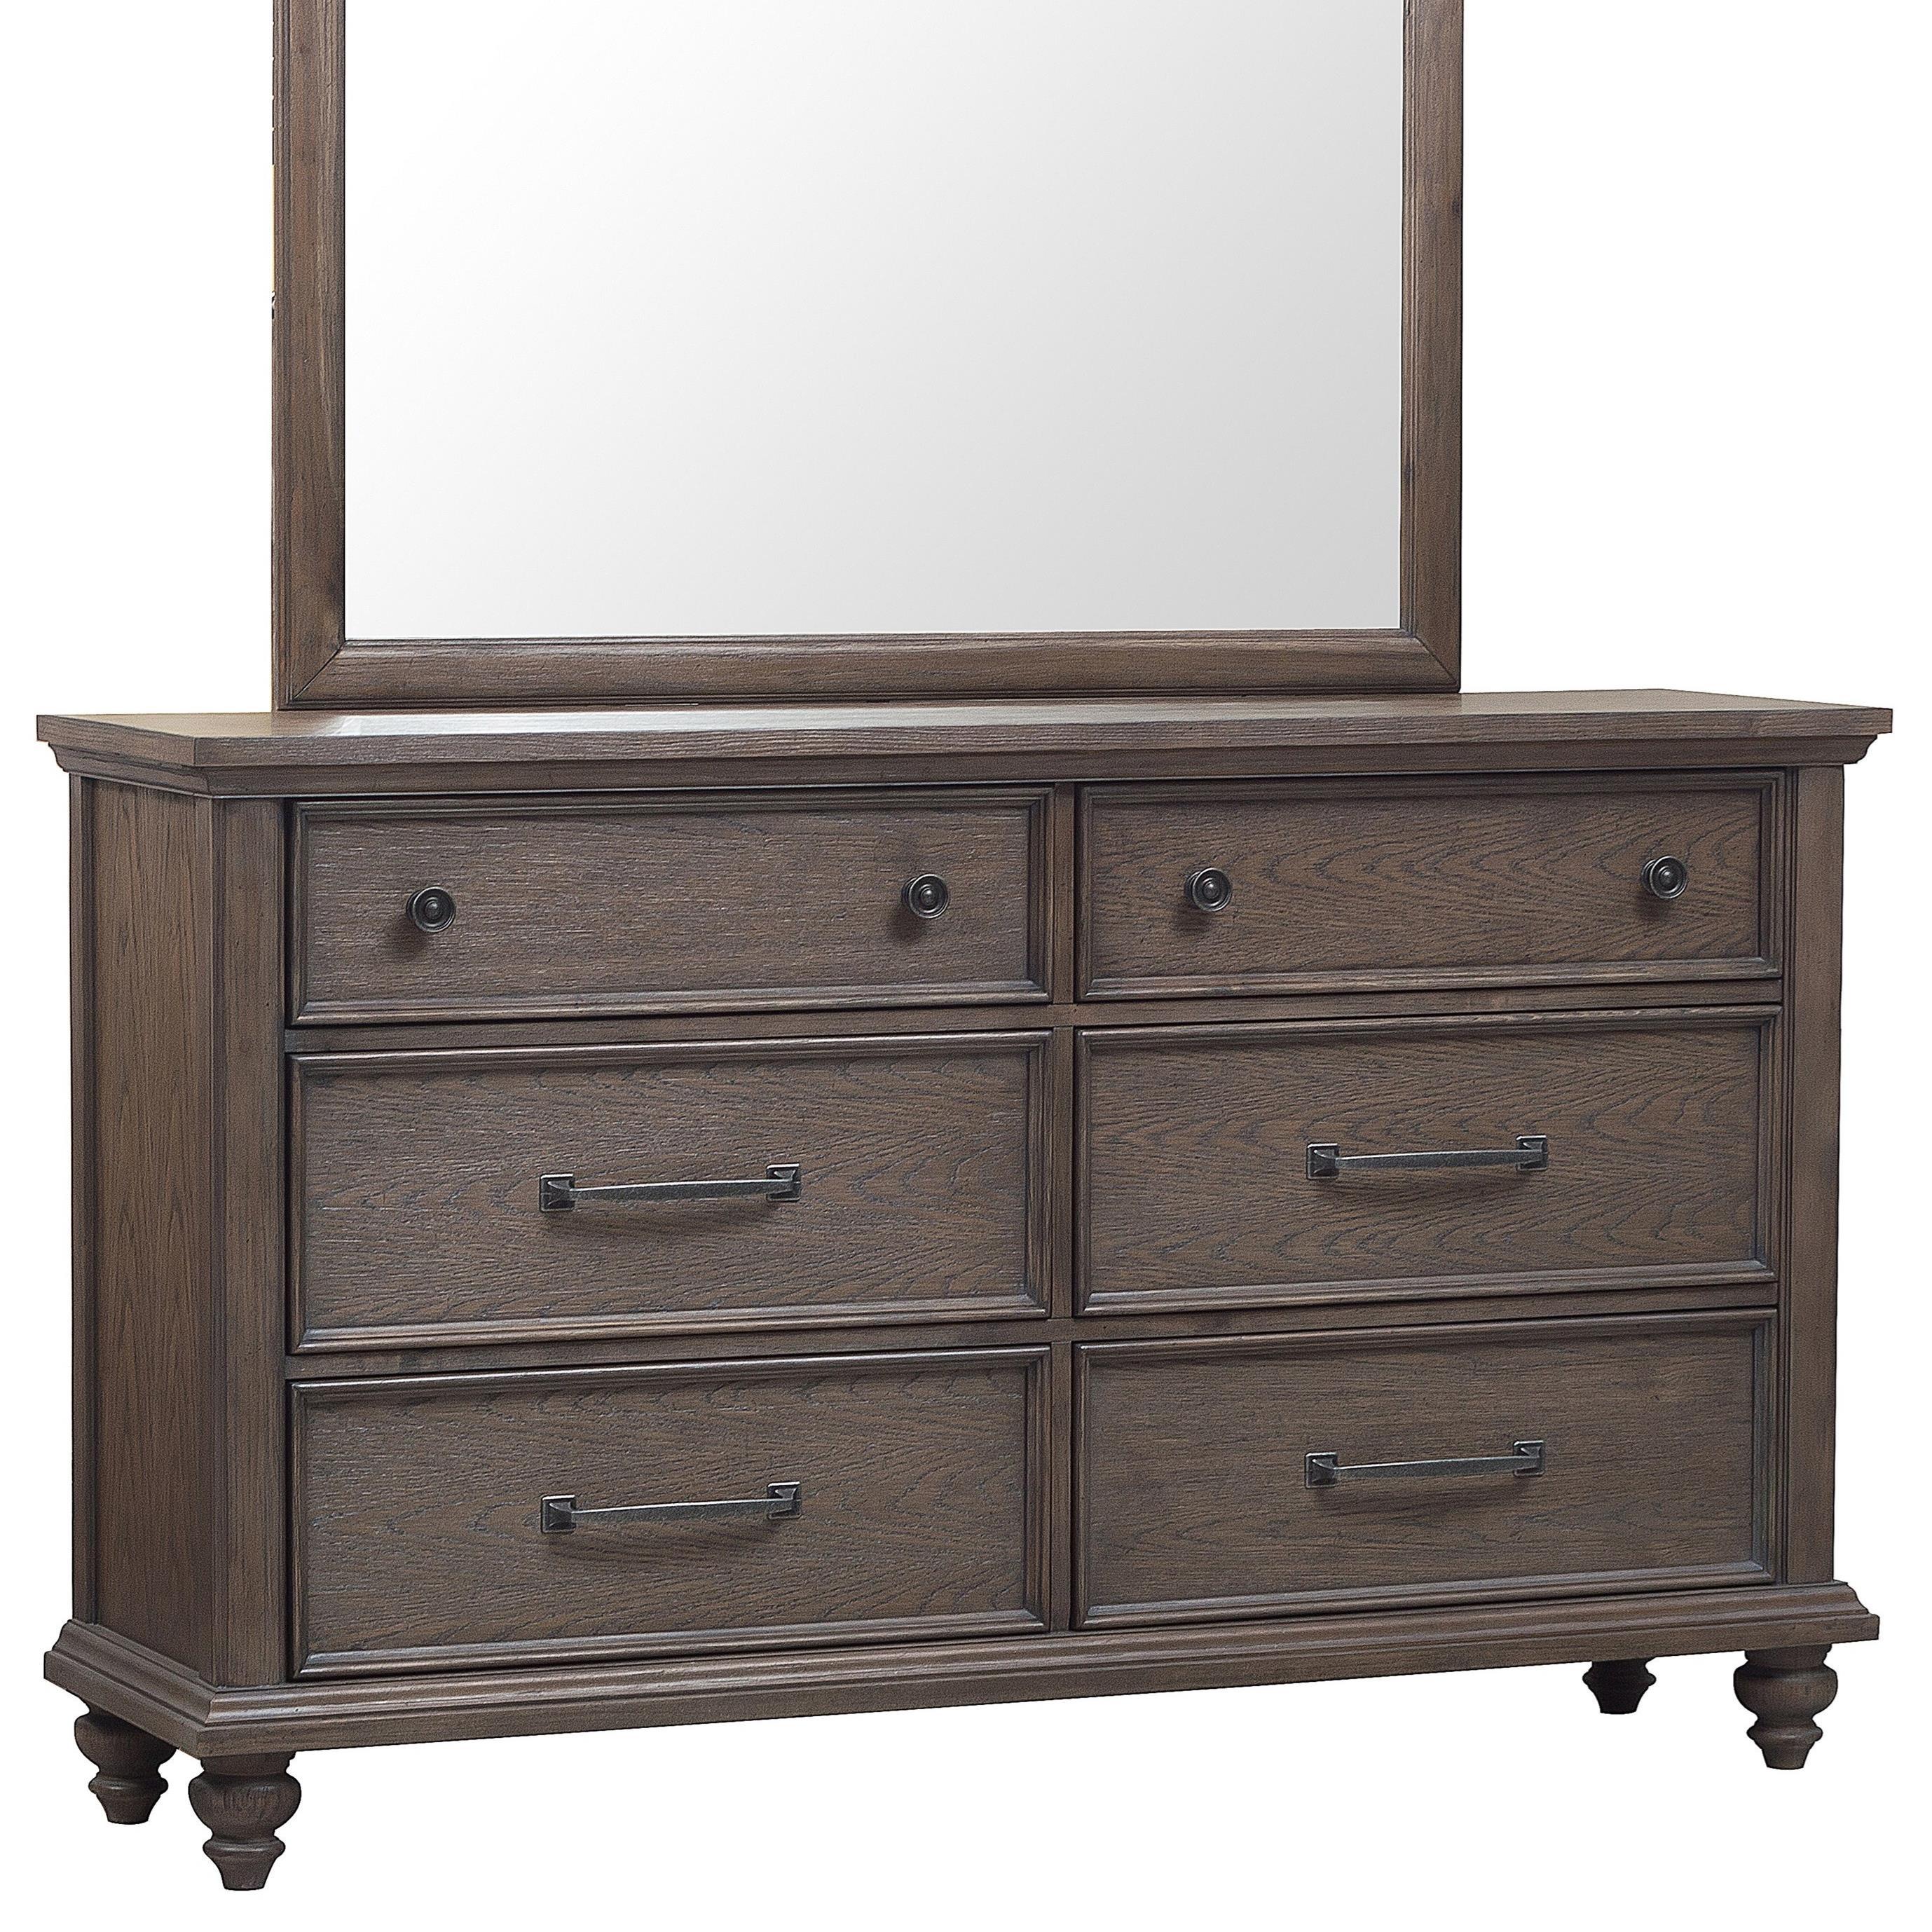 Richmond Dresser by Klaussner International at Catalog Outlet